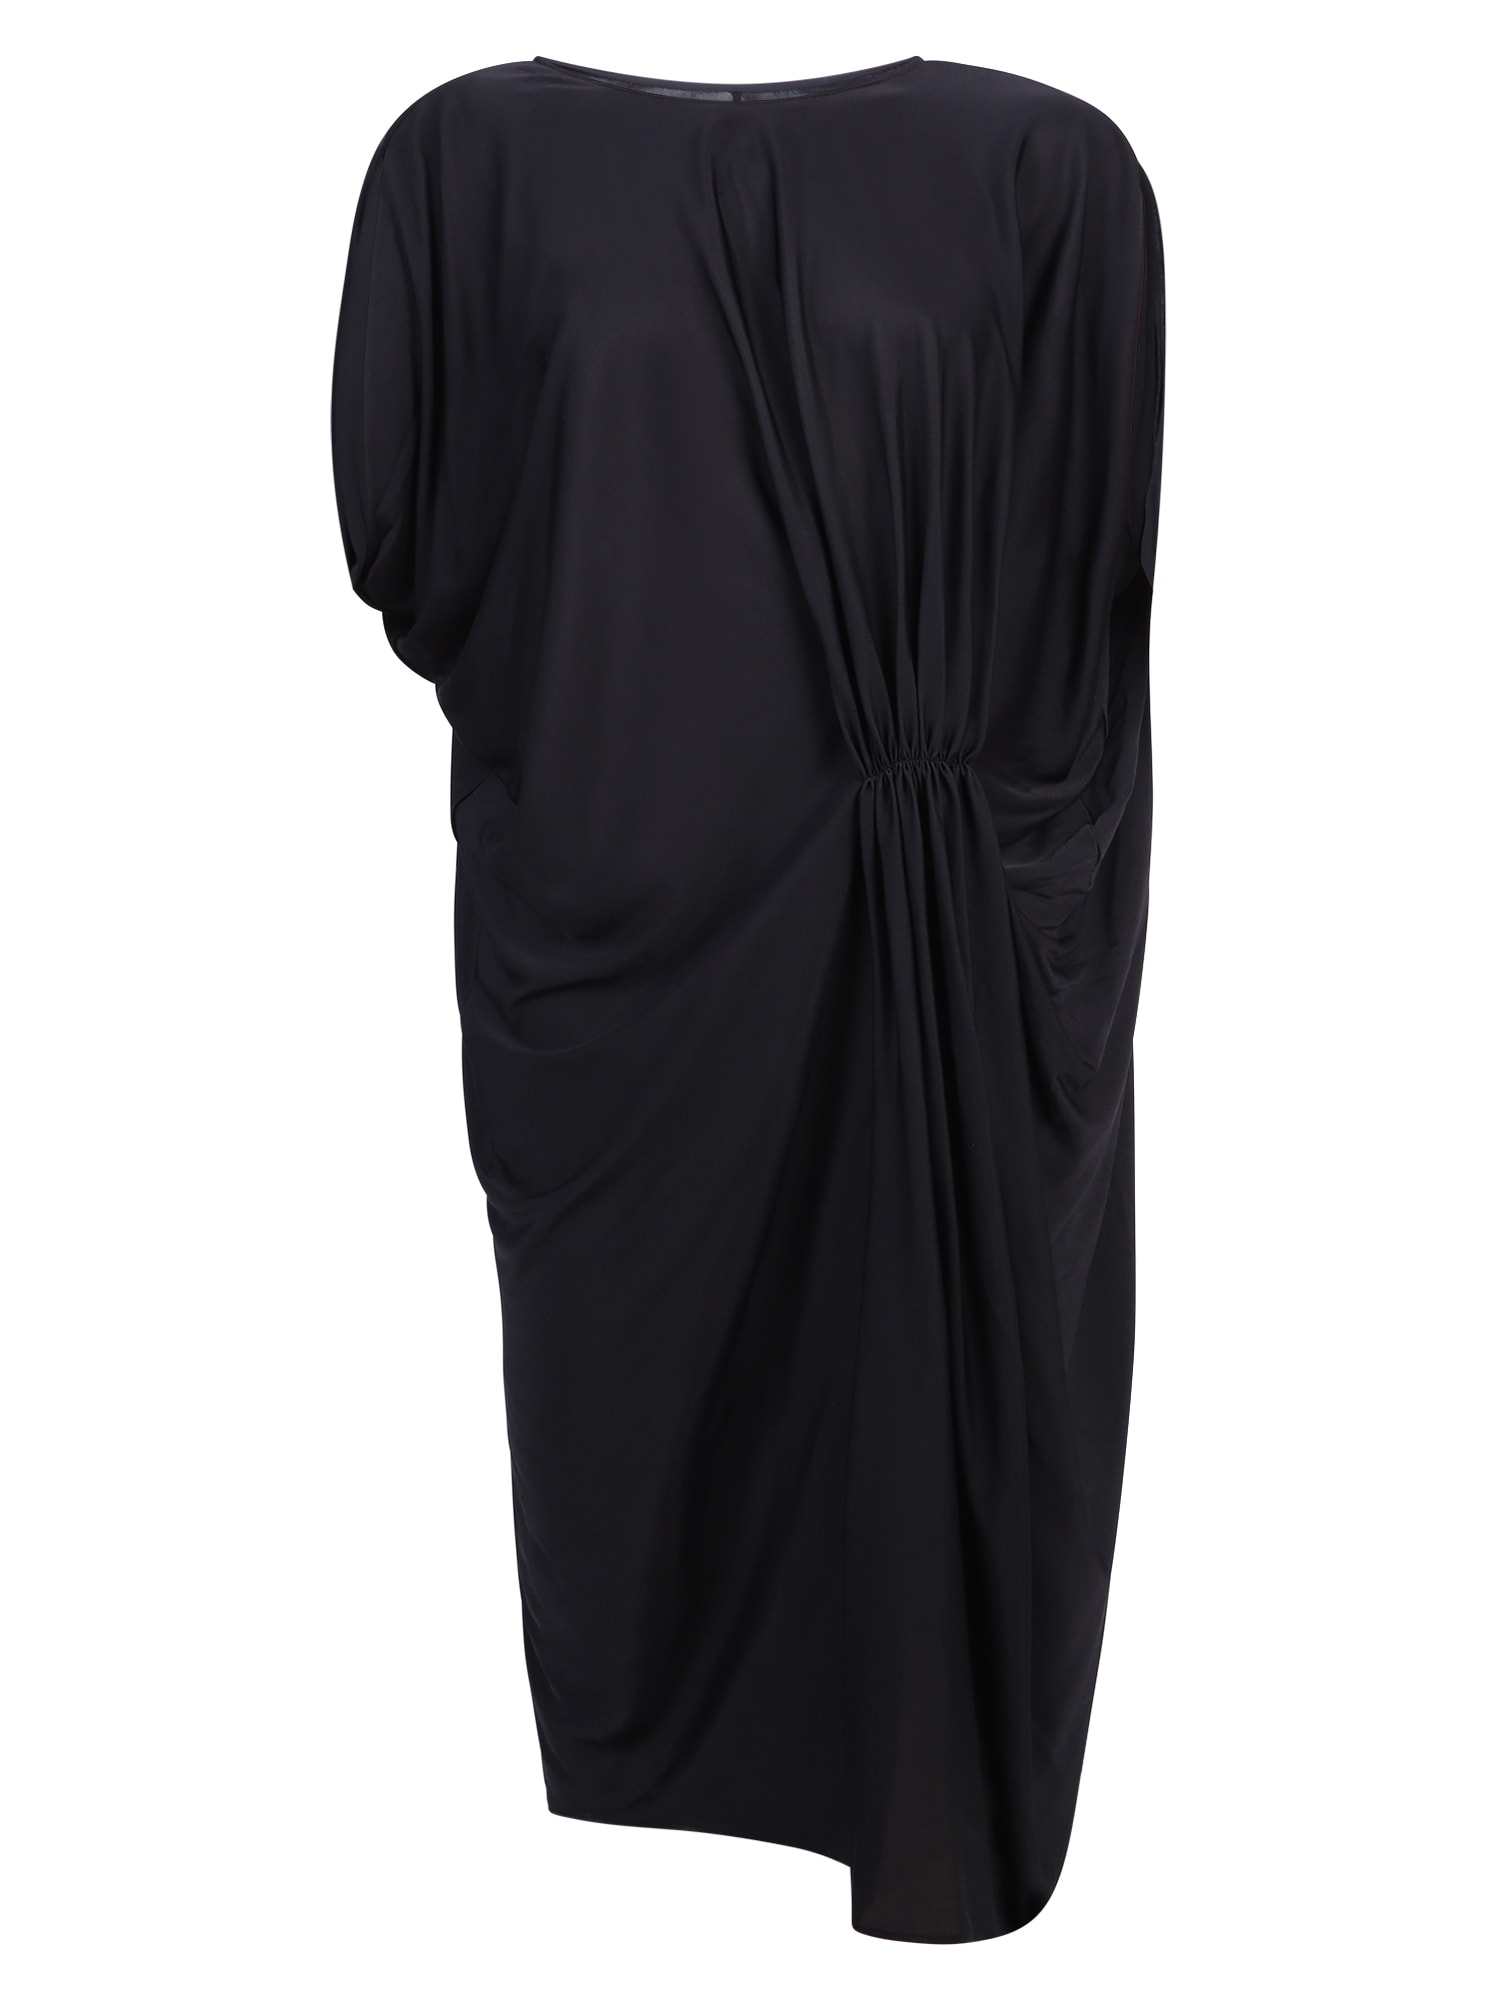 Maison Margiela Draped Dress